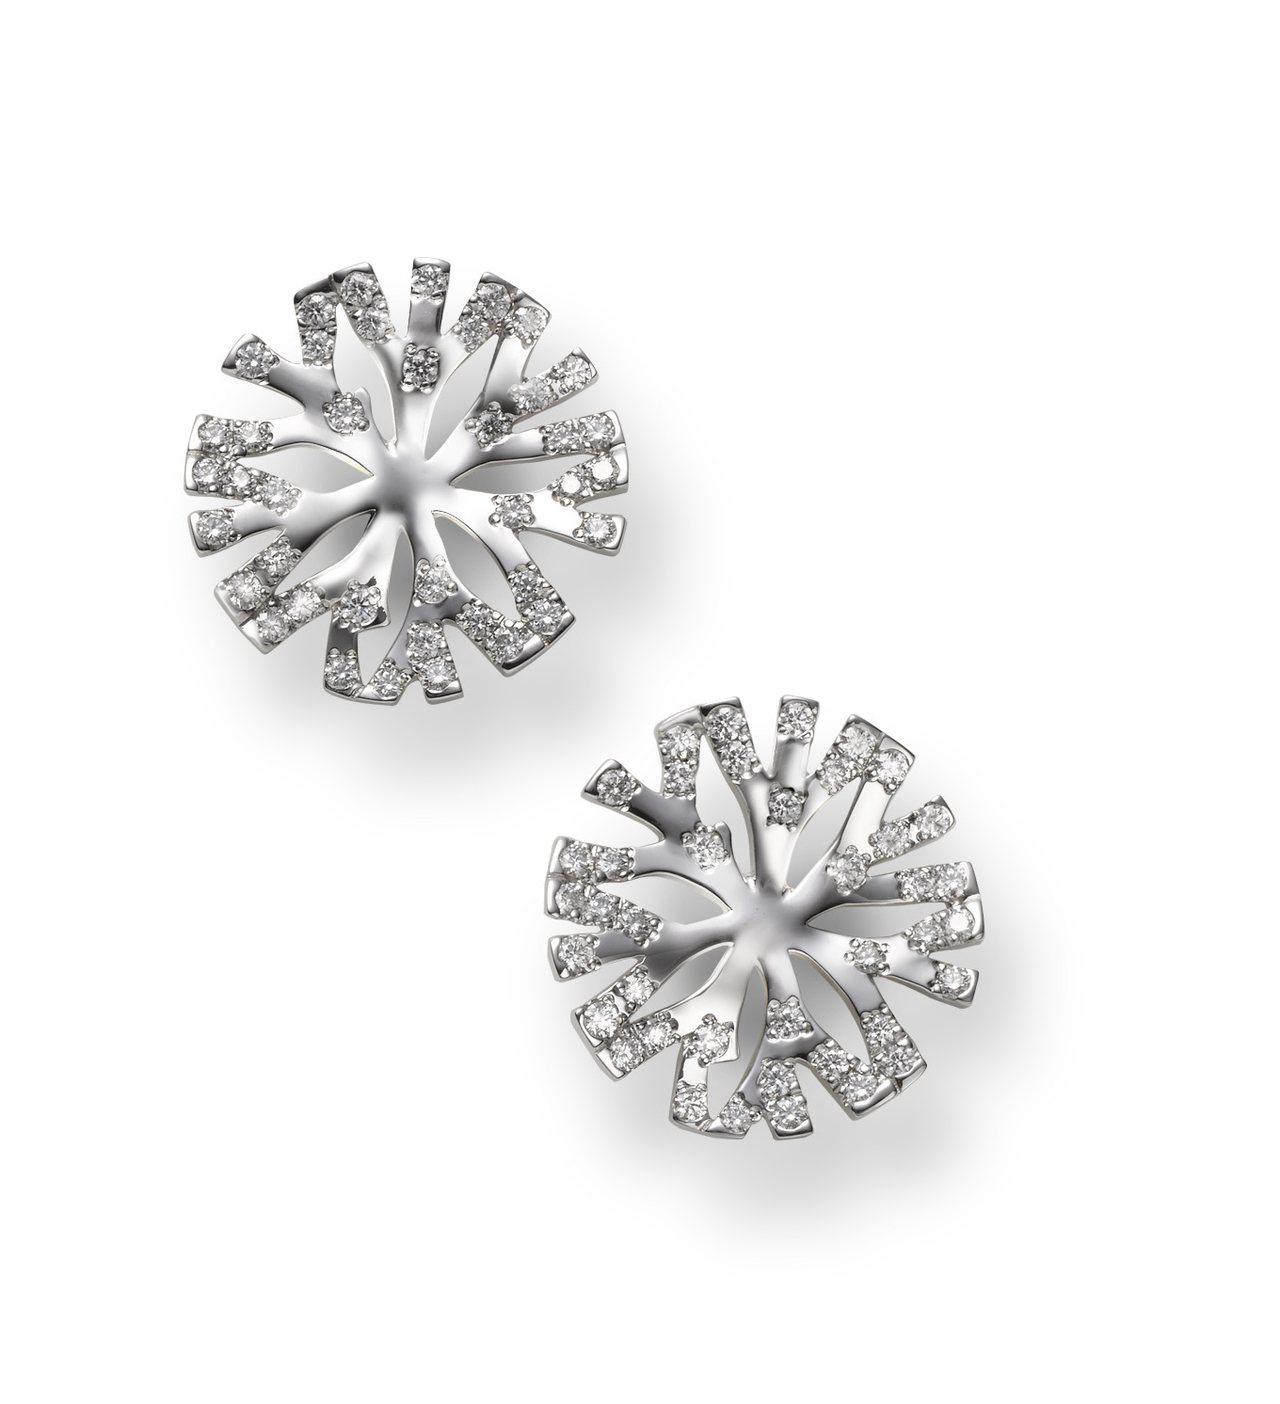 Coral Collection 18K白金鑽石耳環,215,000元。圖/MI...